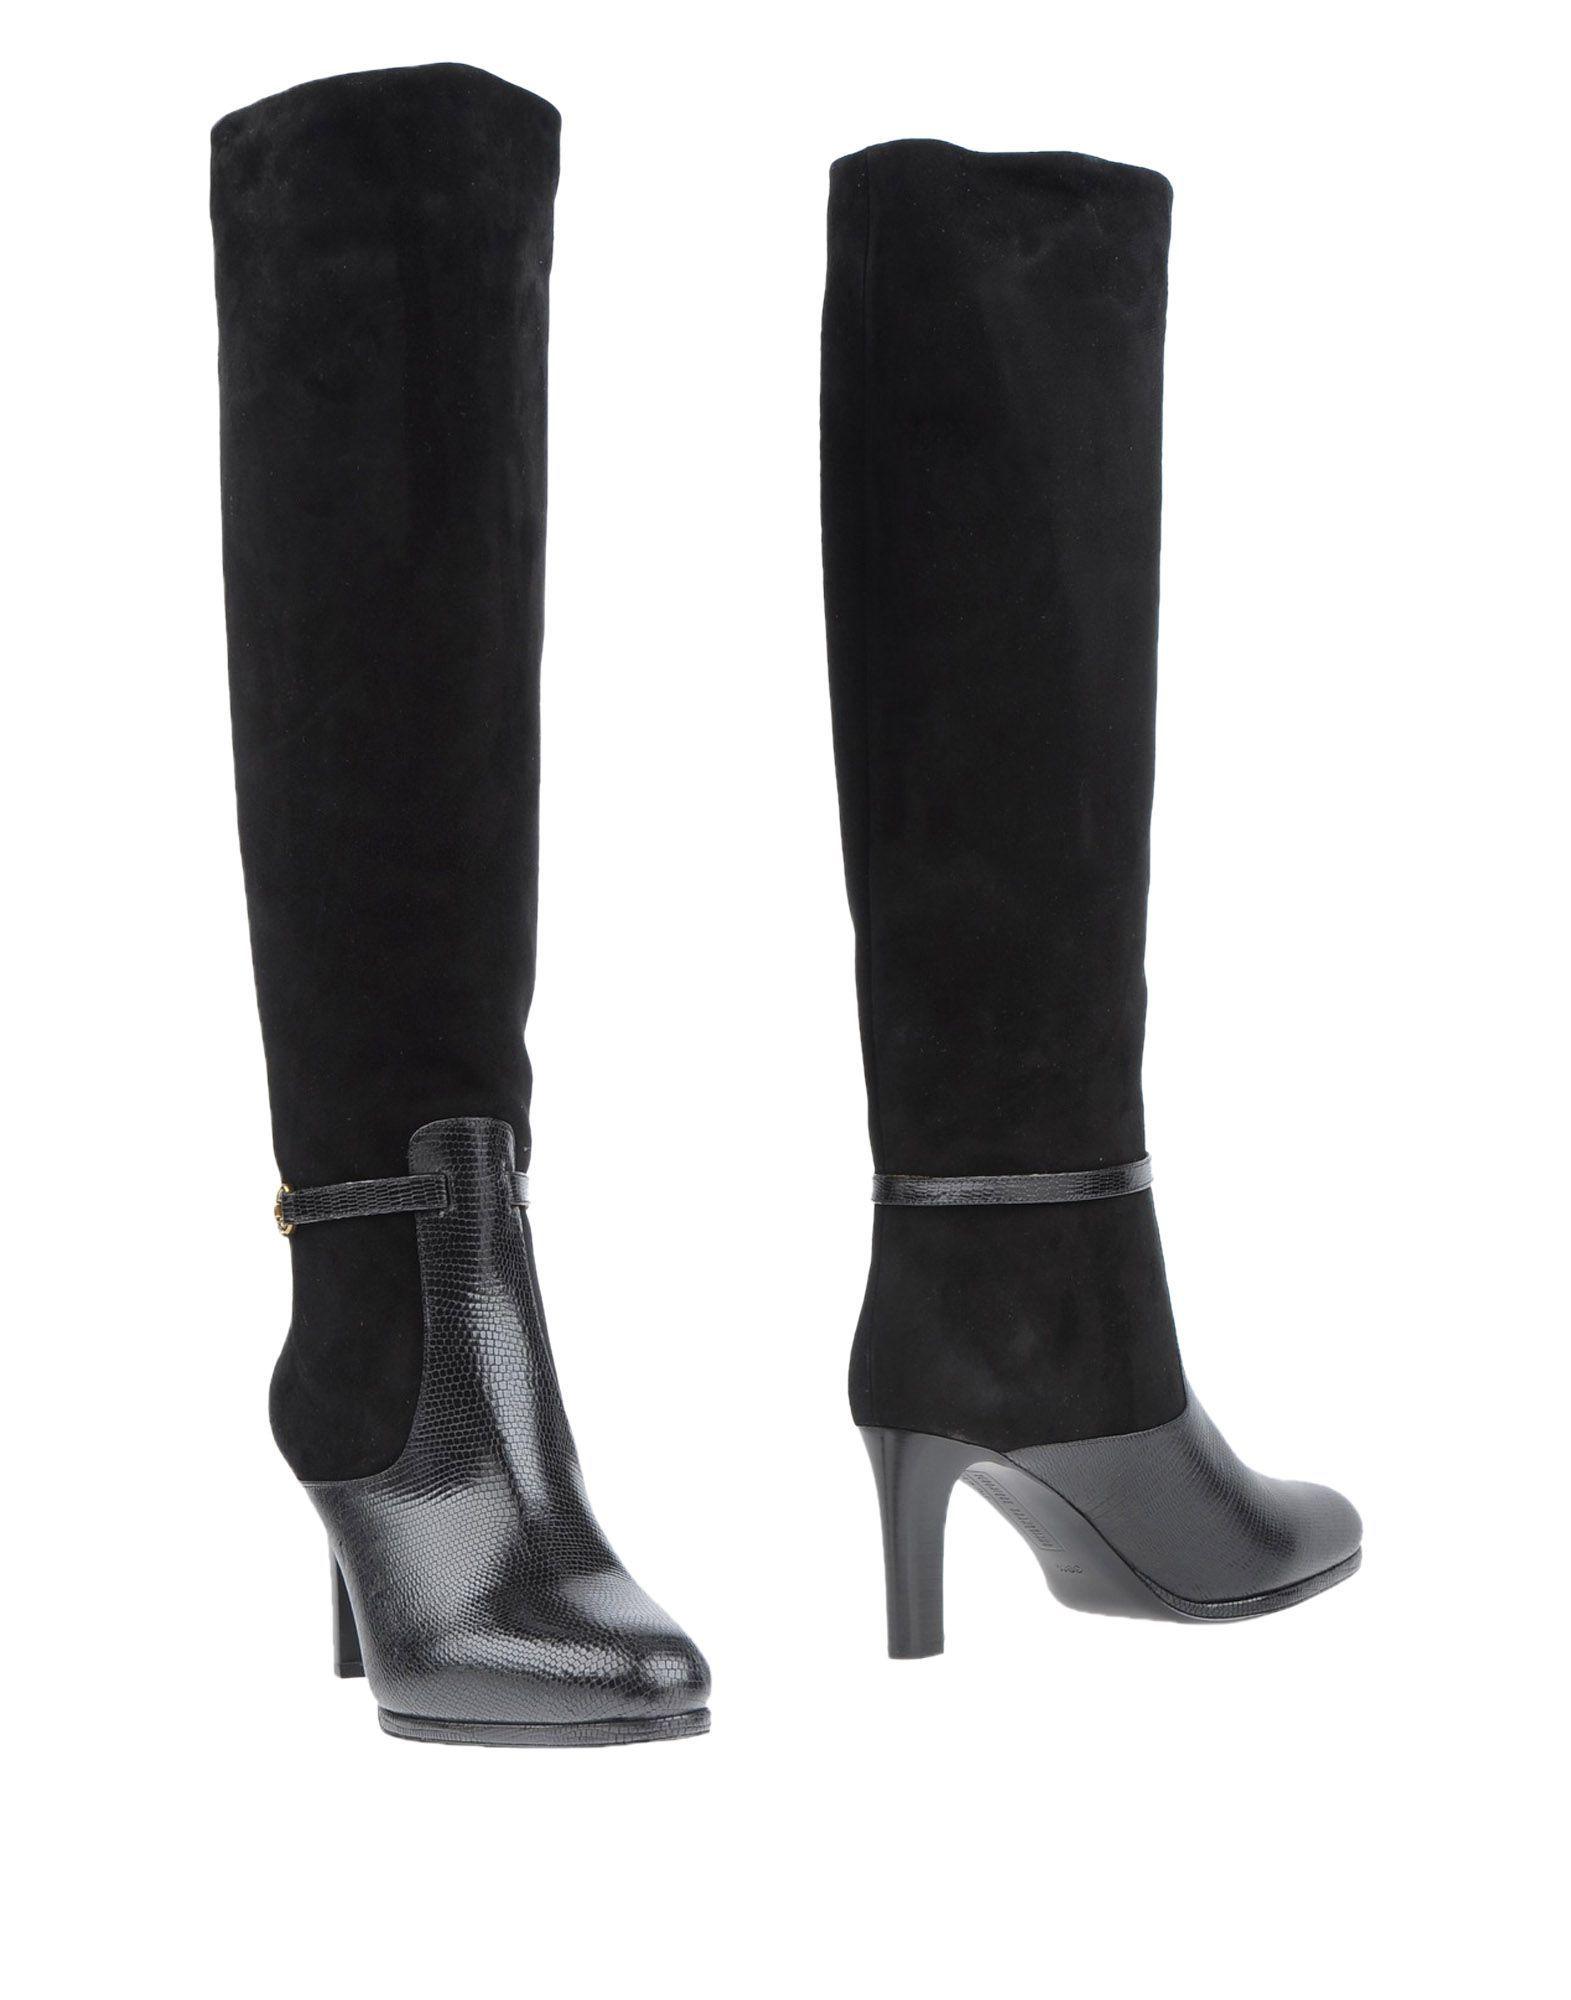 Veronique Branquinho Black Leather Knee High Boots